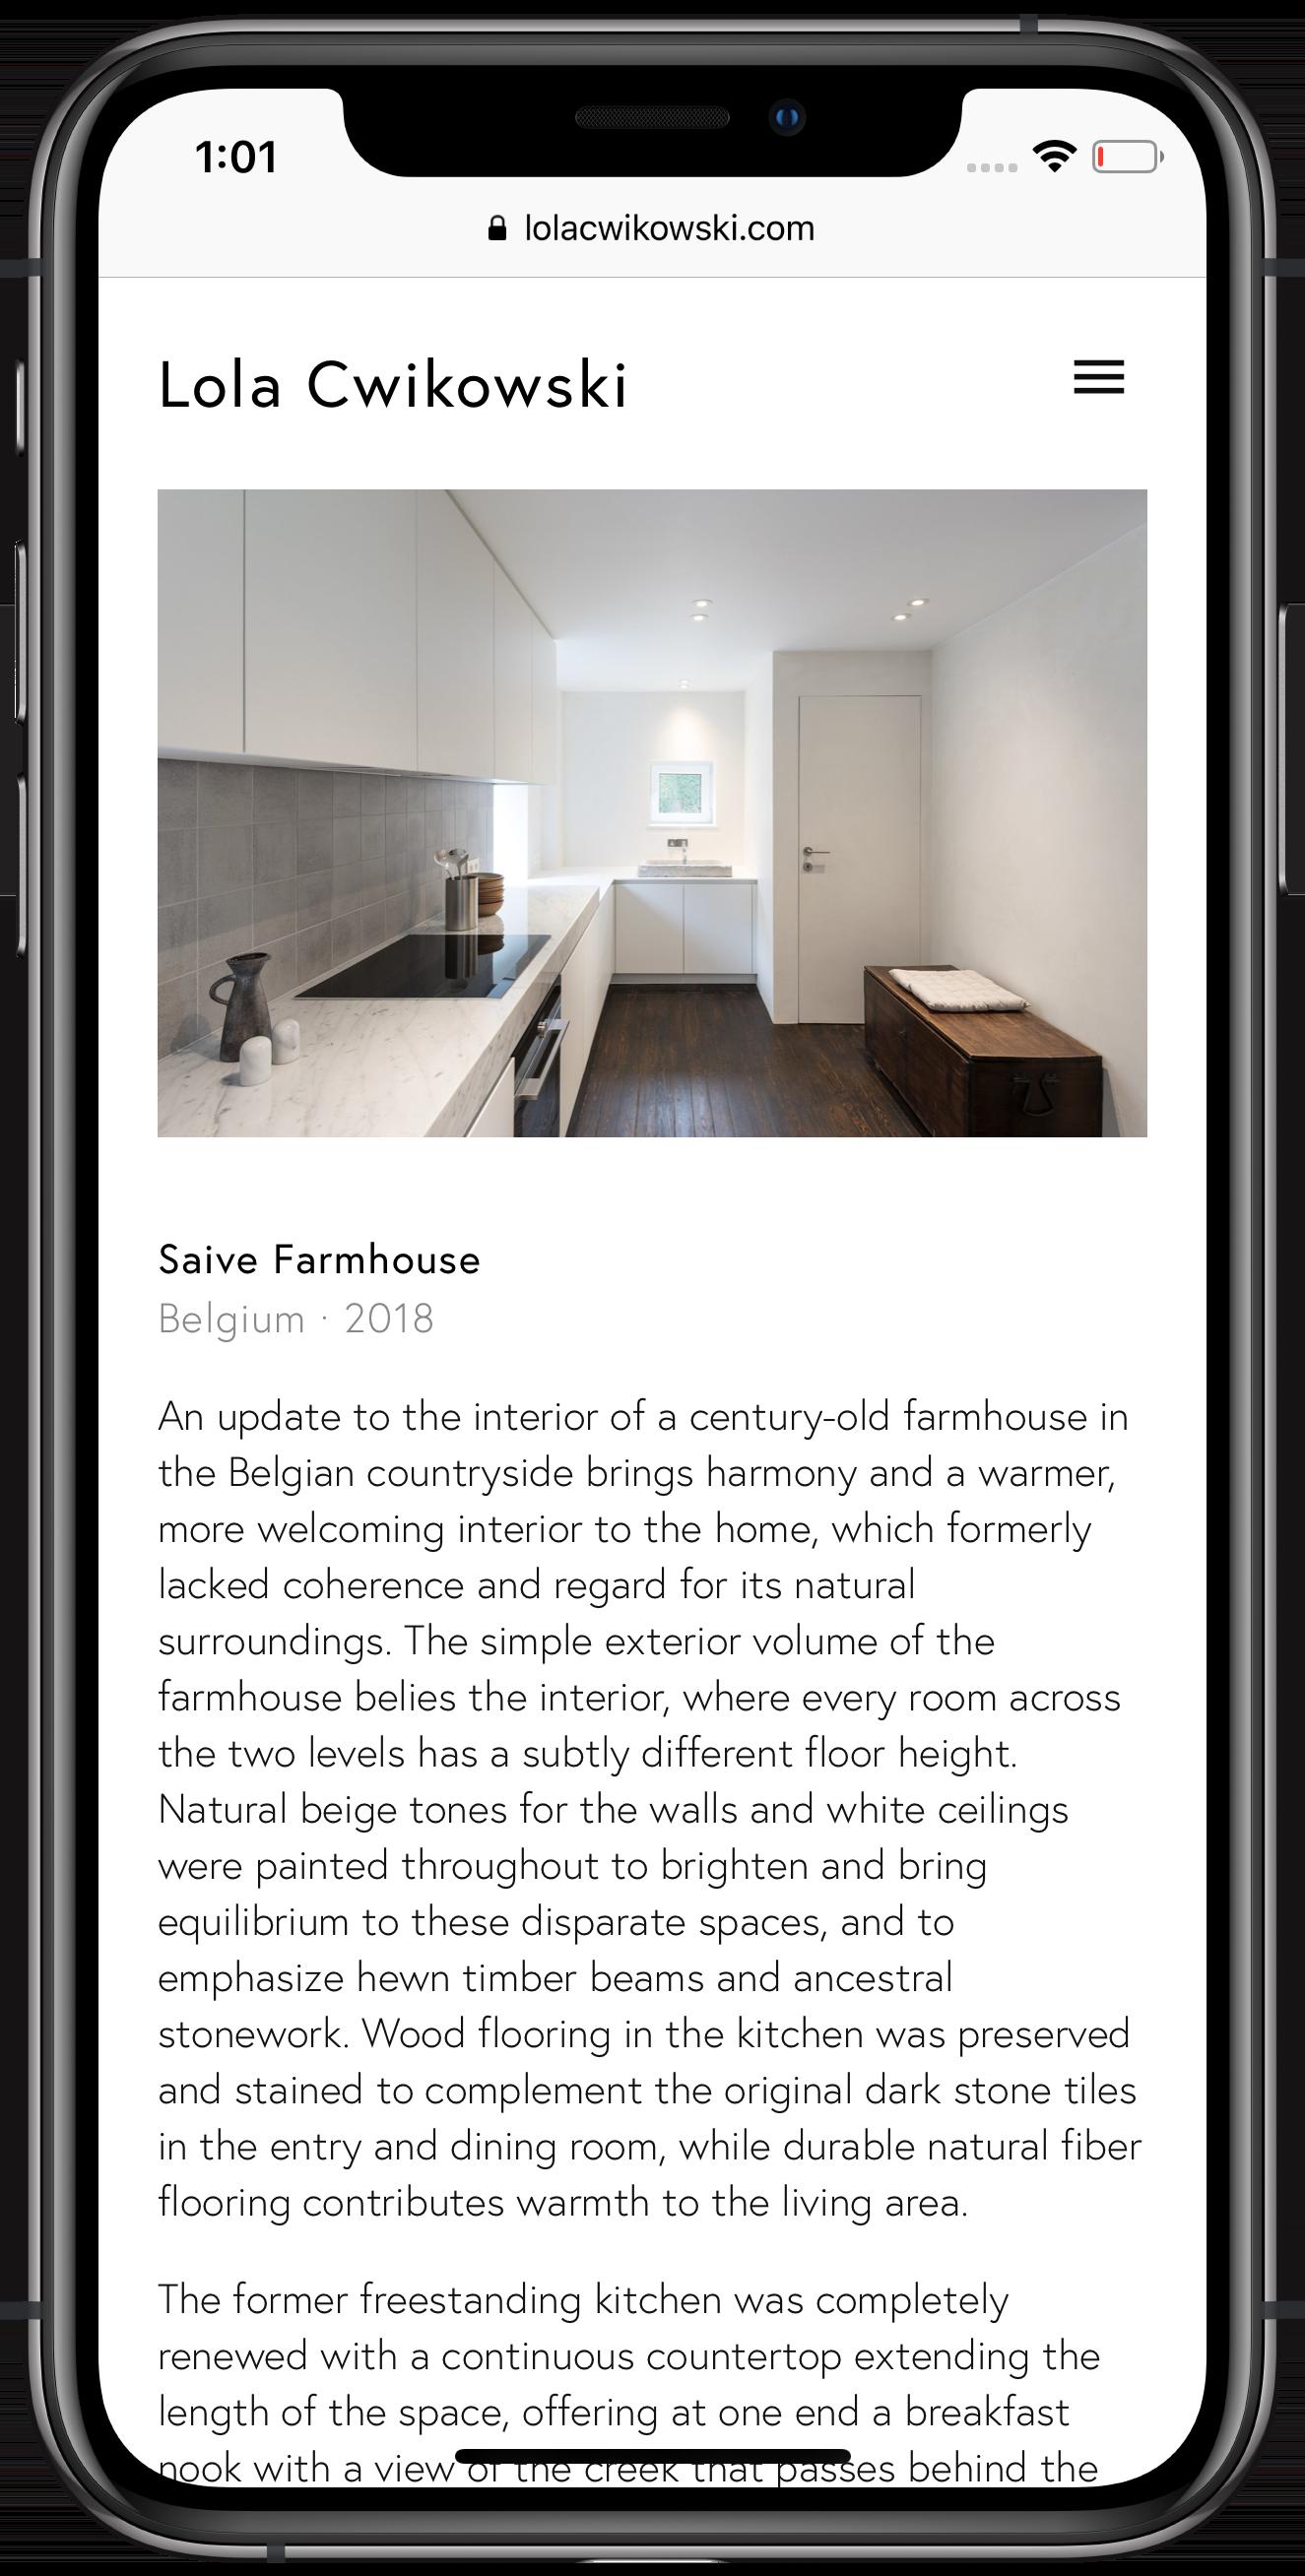 Screen capture of Lola Cwikowski Interior Design Studio website, Saive Farmhouse project